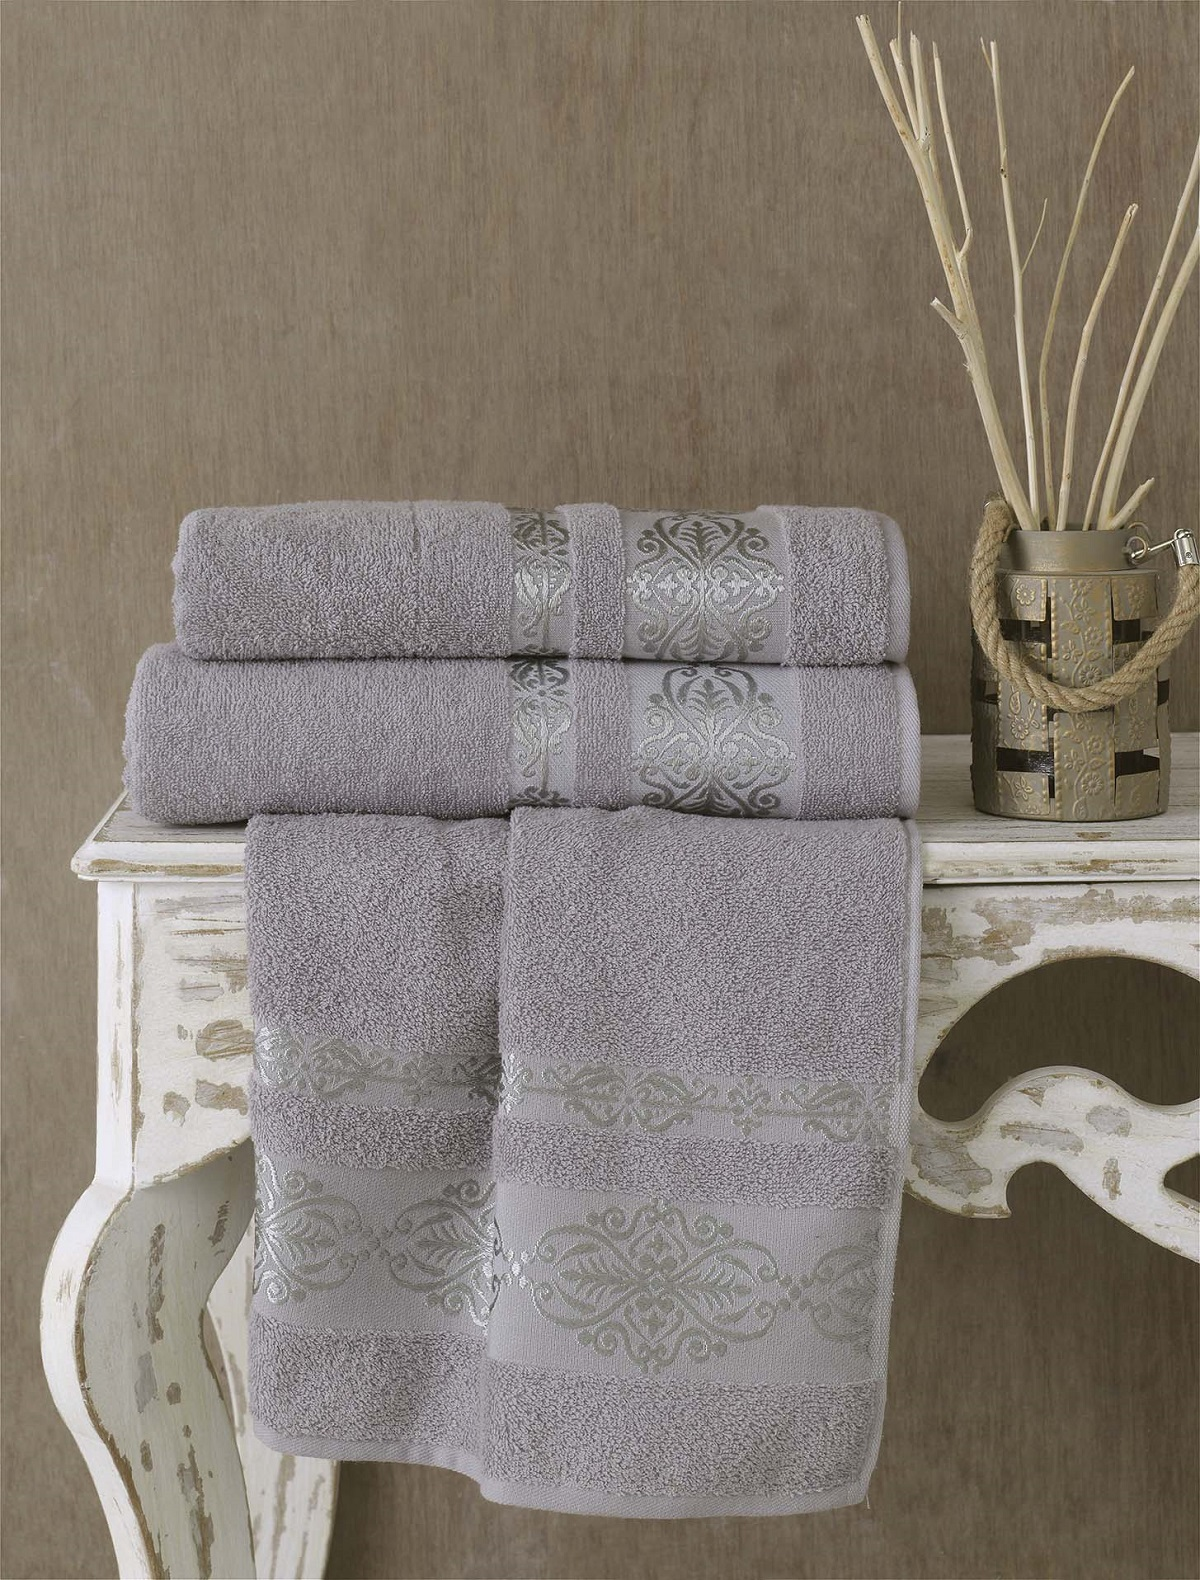 Полотенца Karna Полотенце Rebeka Цвет: Серый (70х140 см) полотенца karna полотенце iteka цвет коричневый 70х140 см